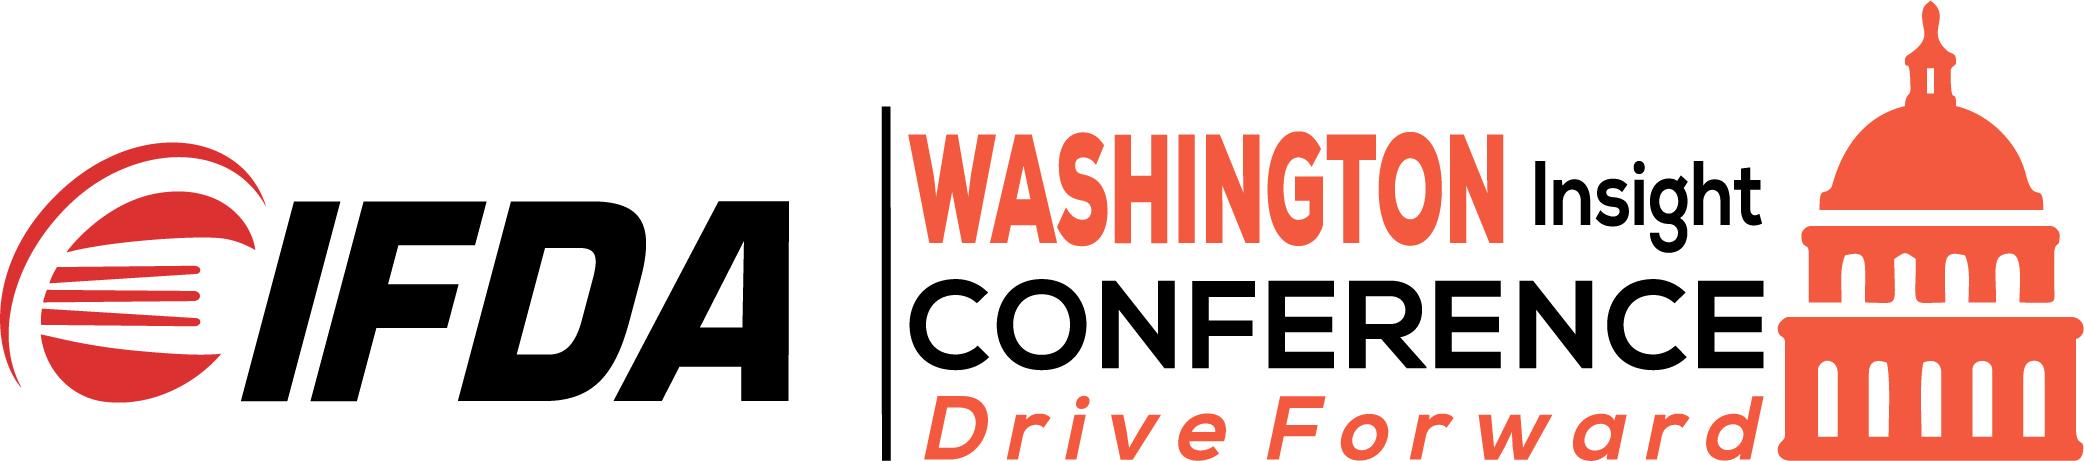 Event Display IWIC - 2020 IFDA Washington Insight Conference